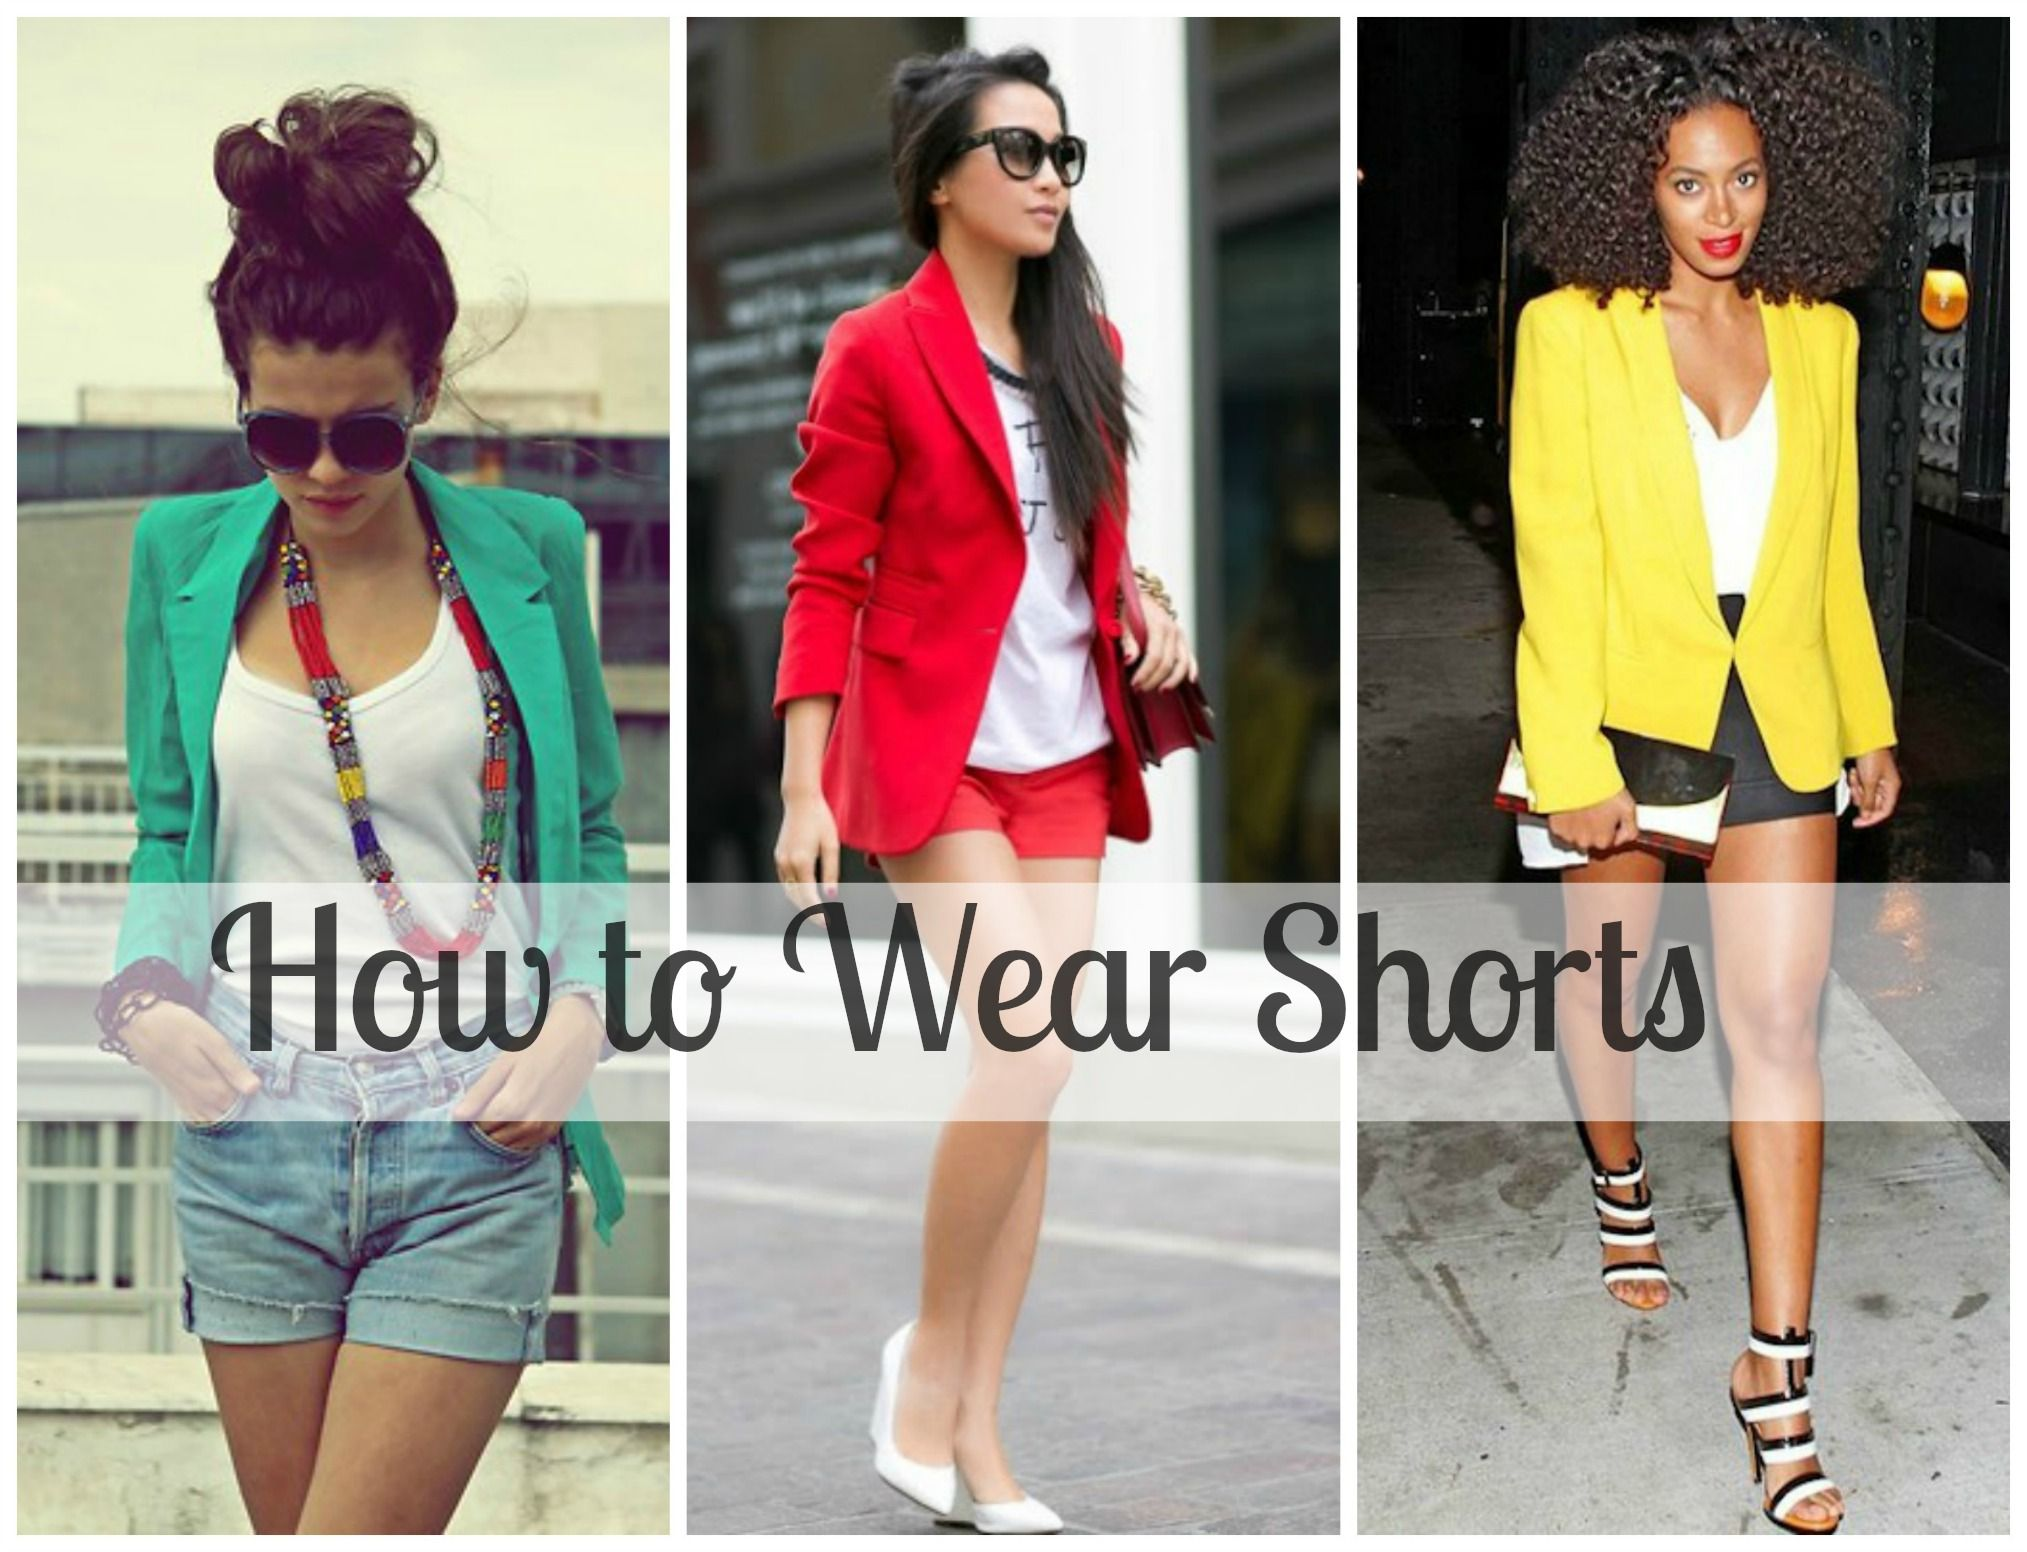 Fashion week Fashion Summer trends tumblr for girls